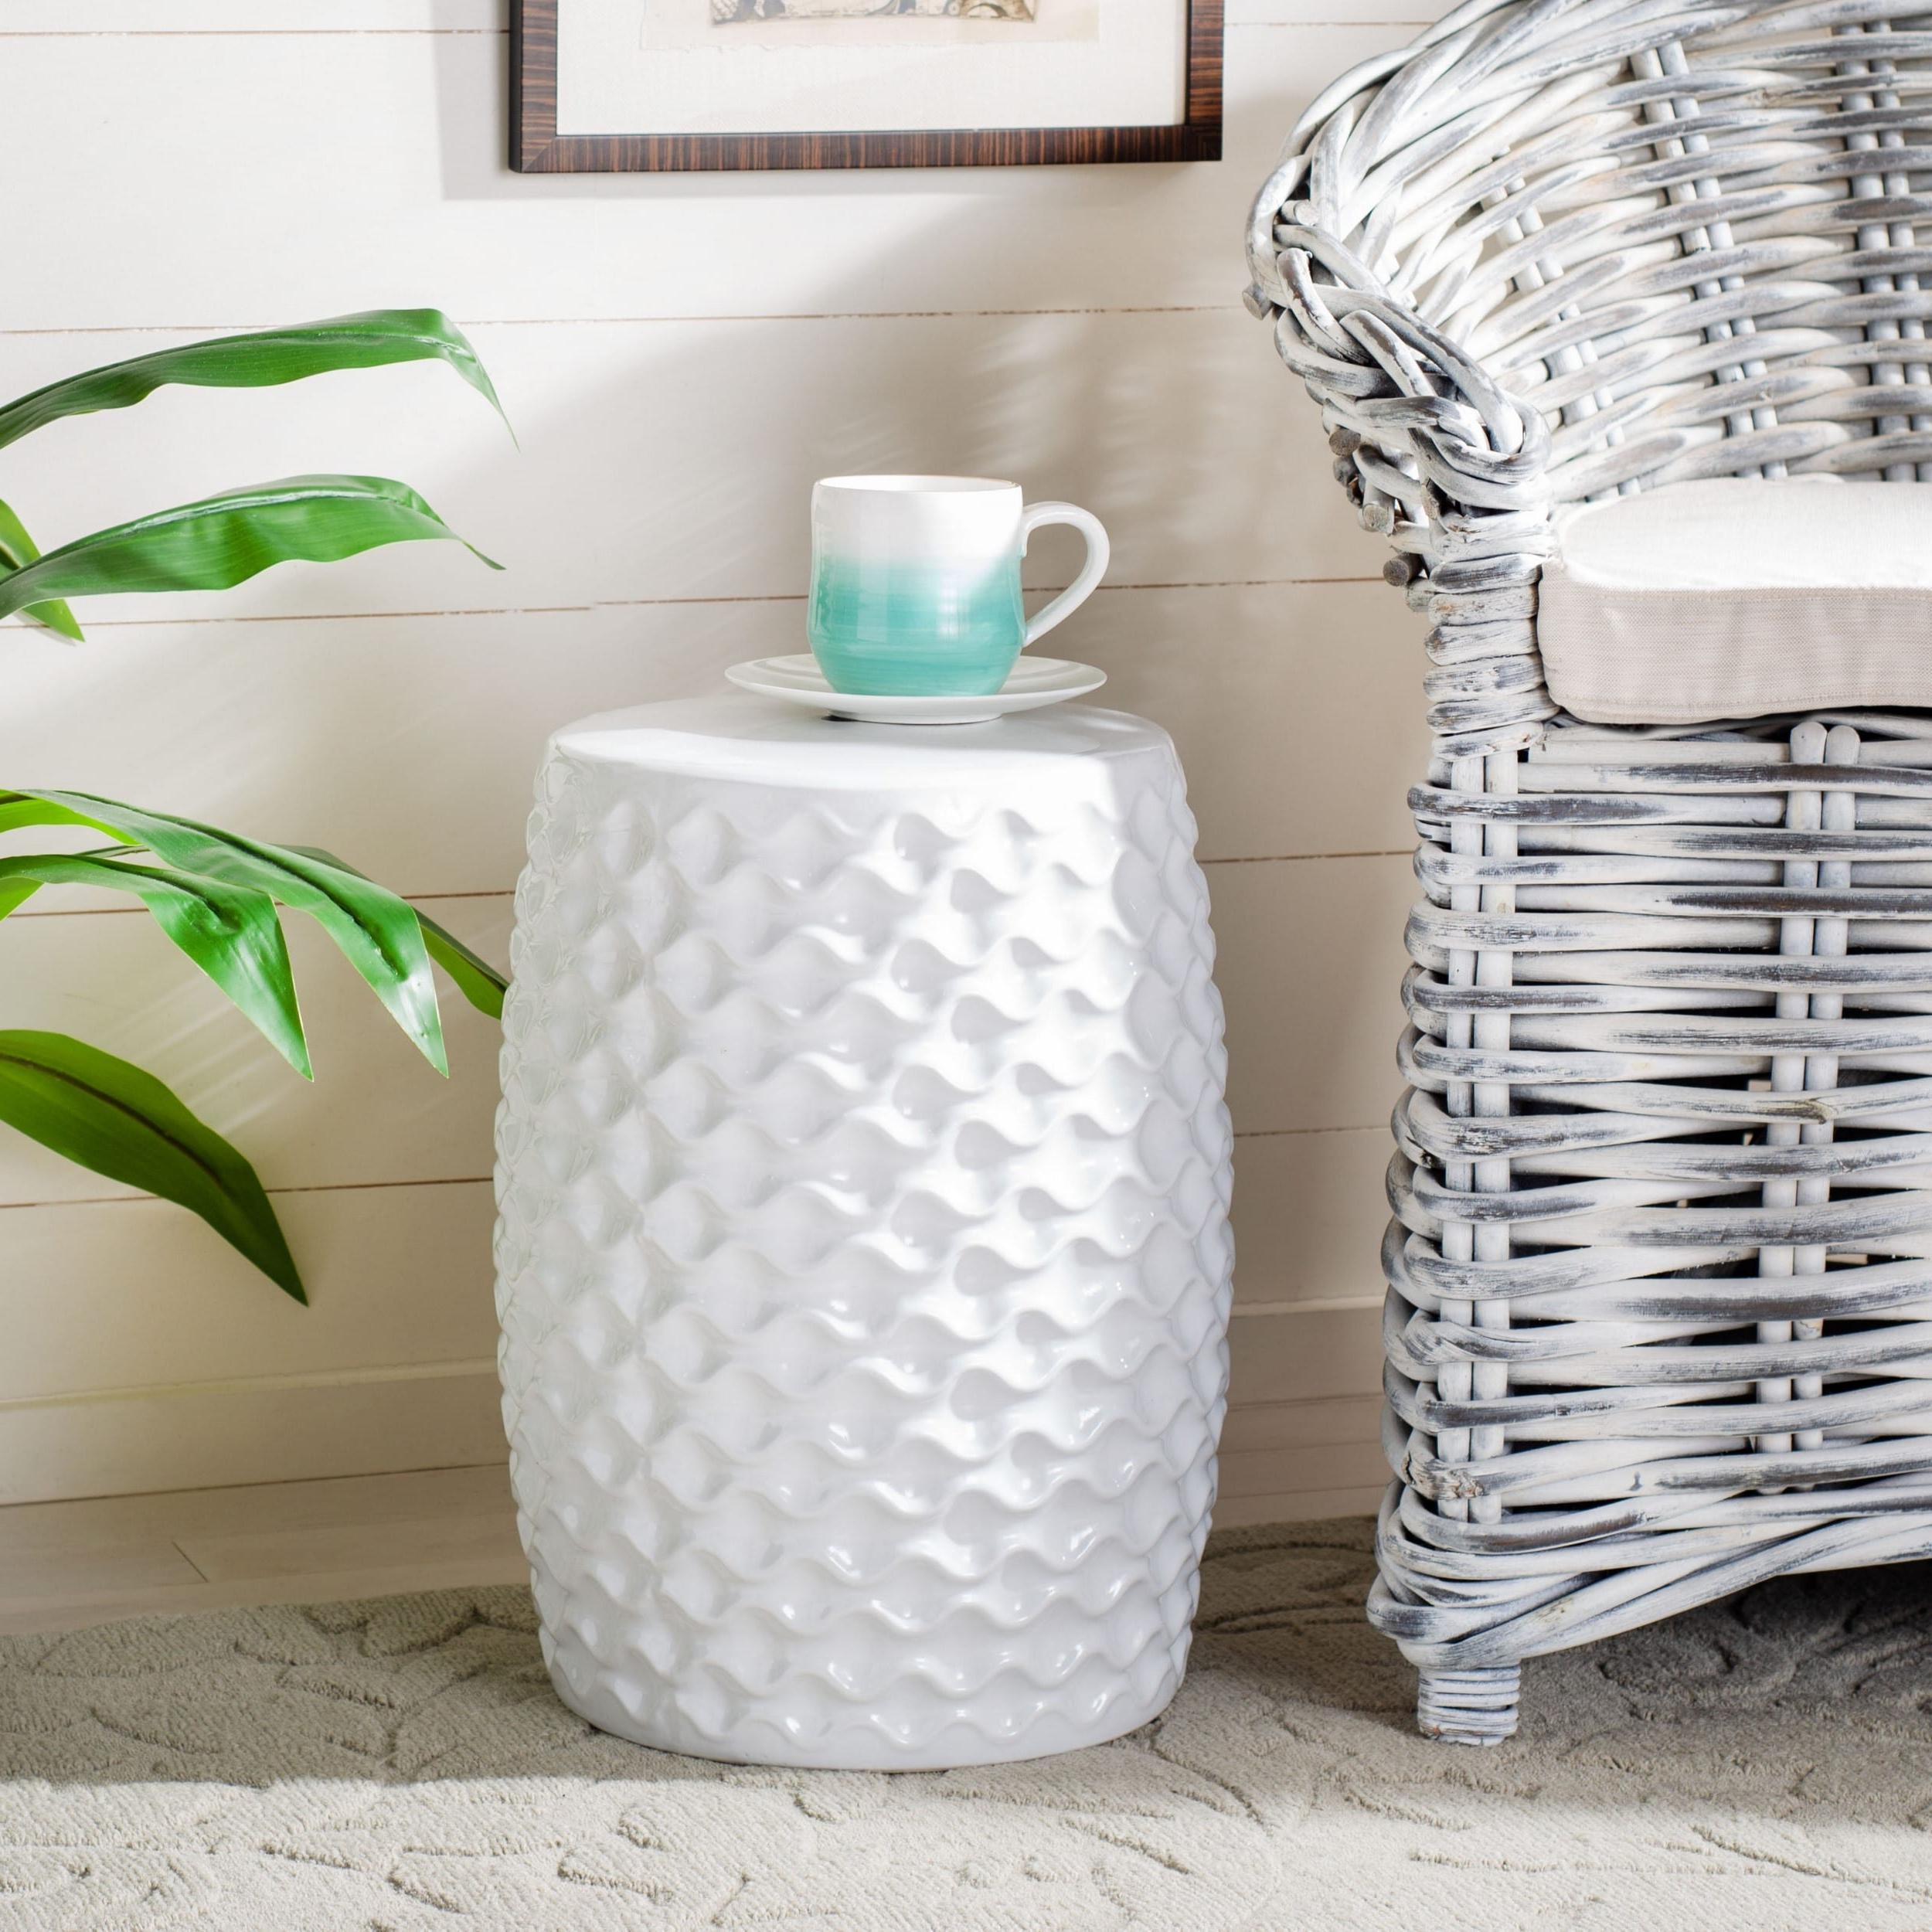 Safavieh Randon Indoor / Outdoor Ceramic Decorative Garden Stool With Latest Ceramic Garden Stools (View 16 of 30)